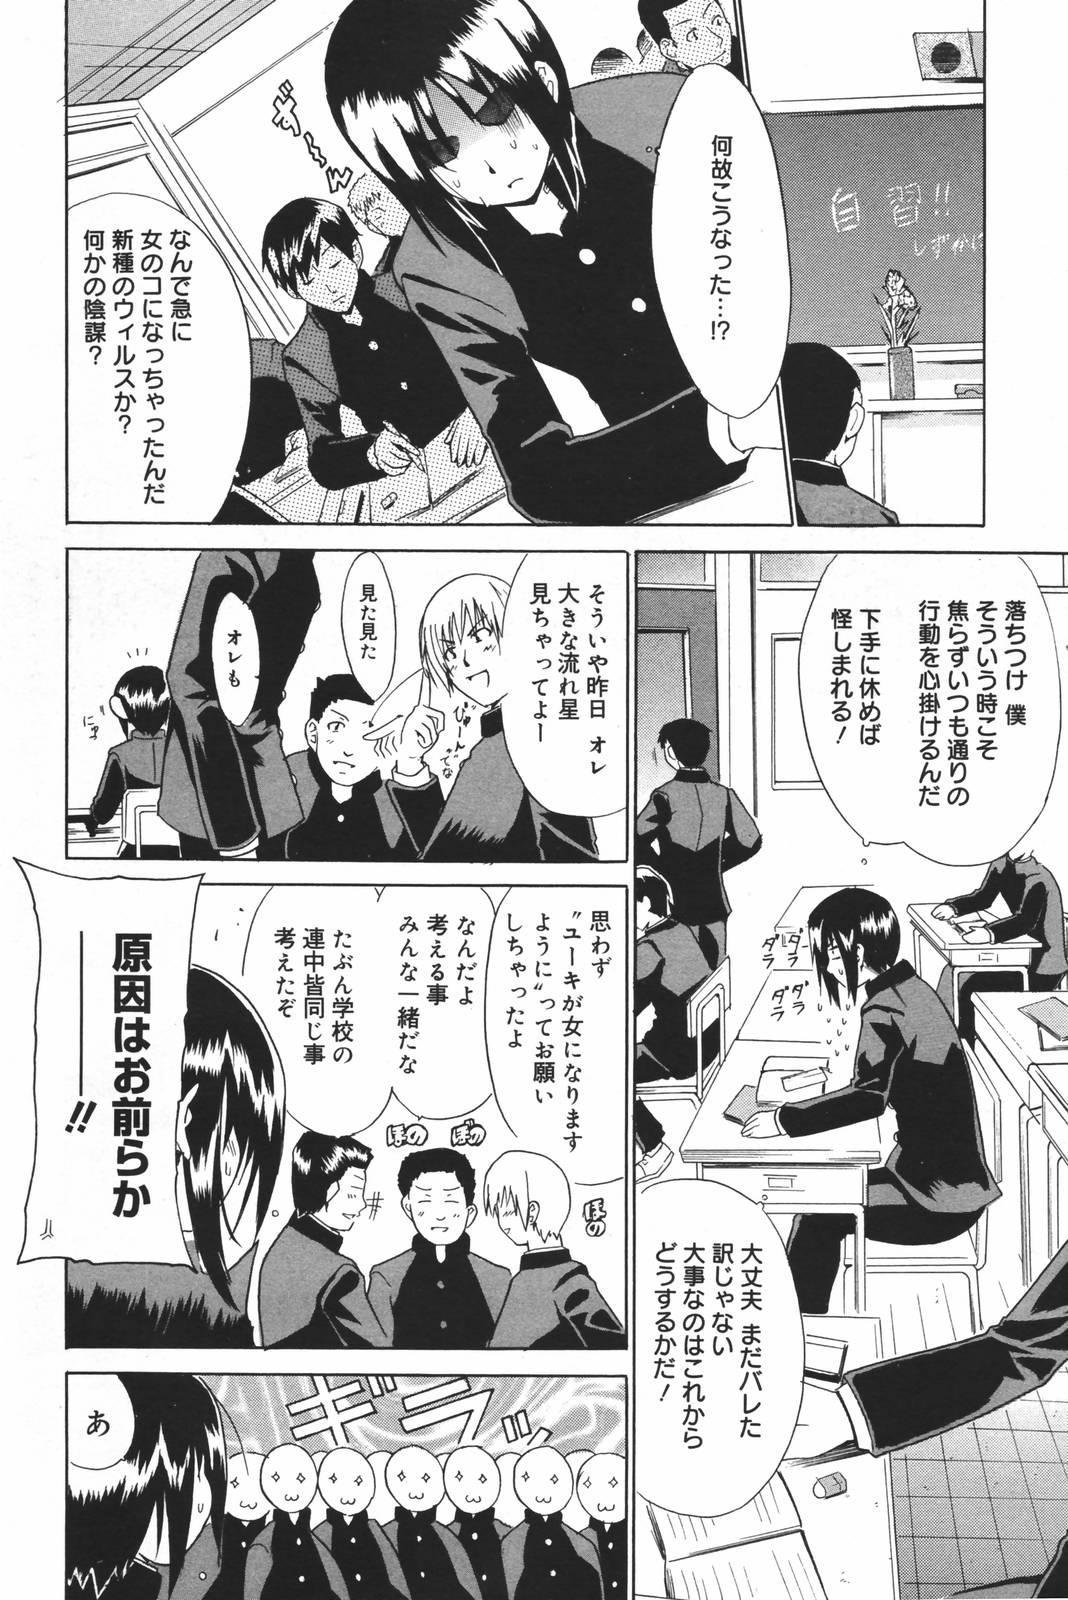 Manga Bangaichi 2007-03 61